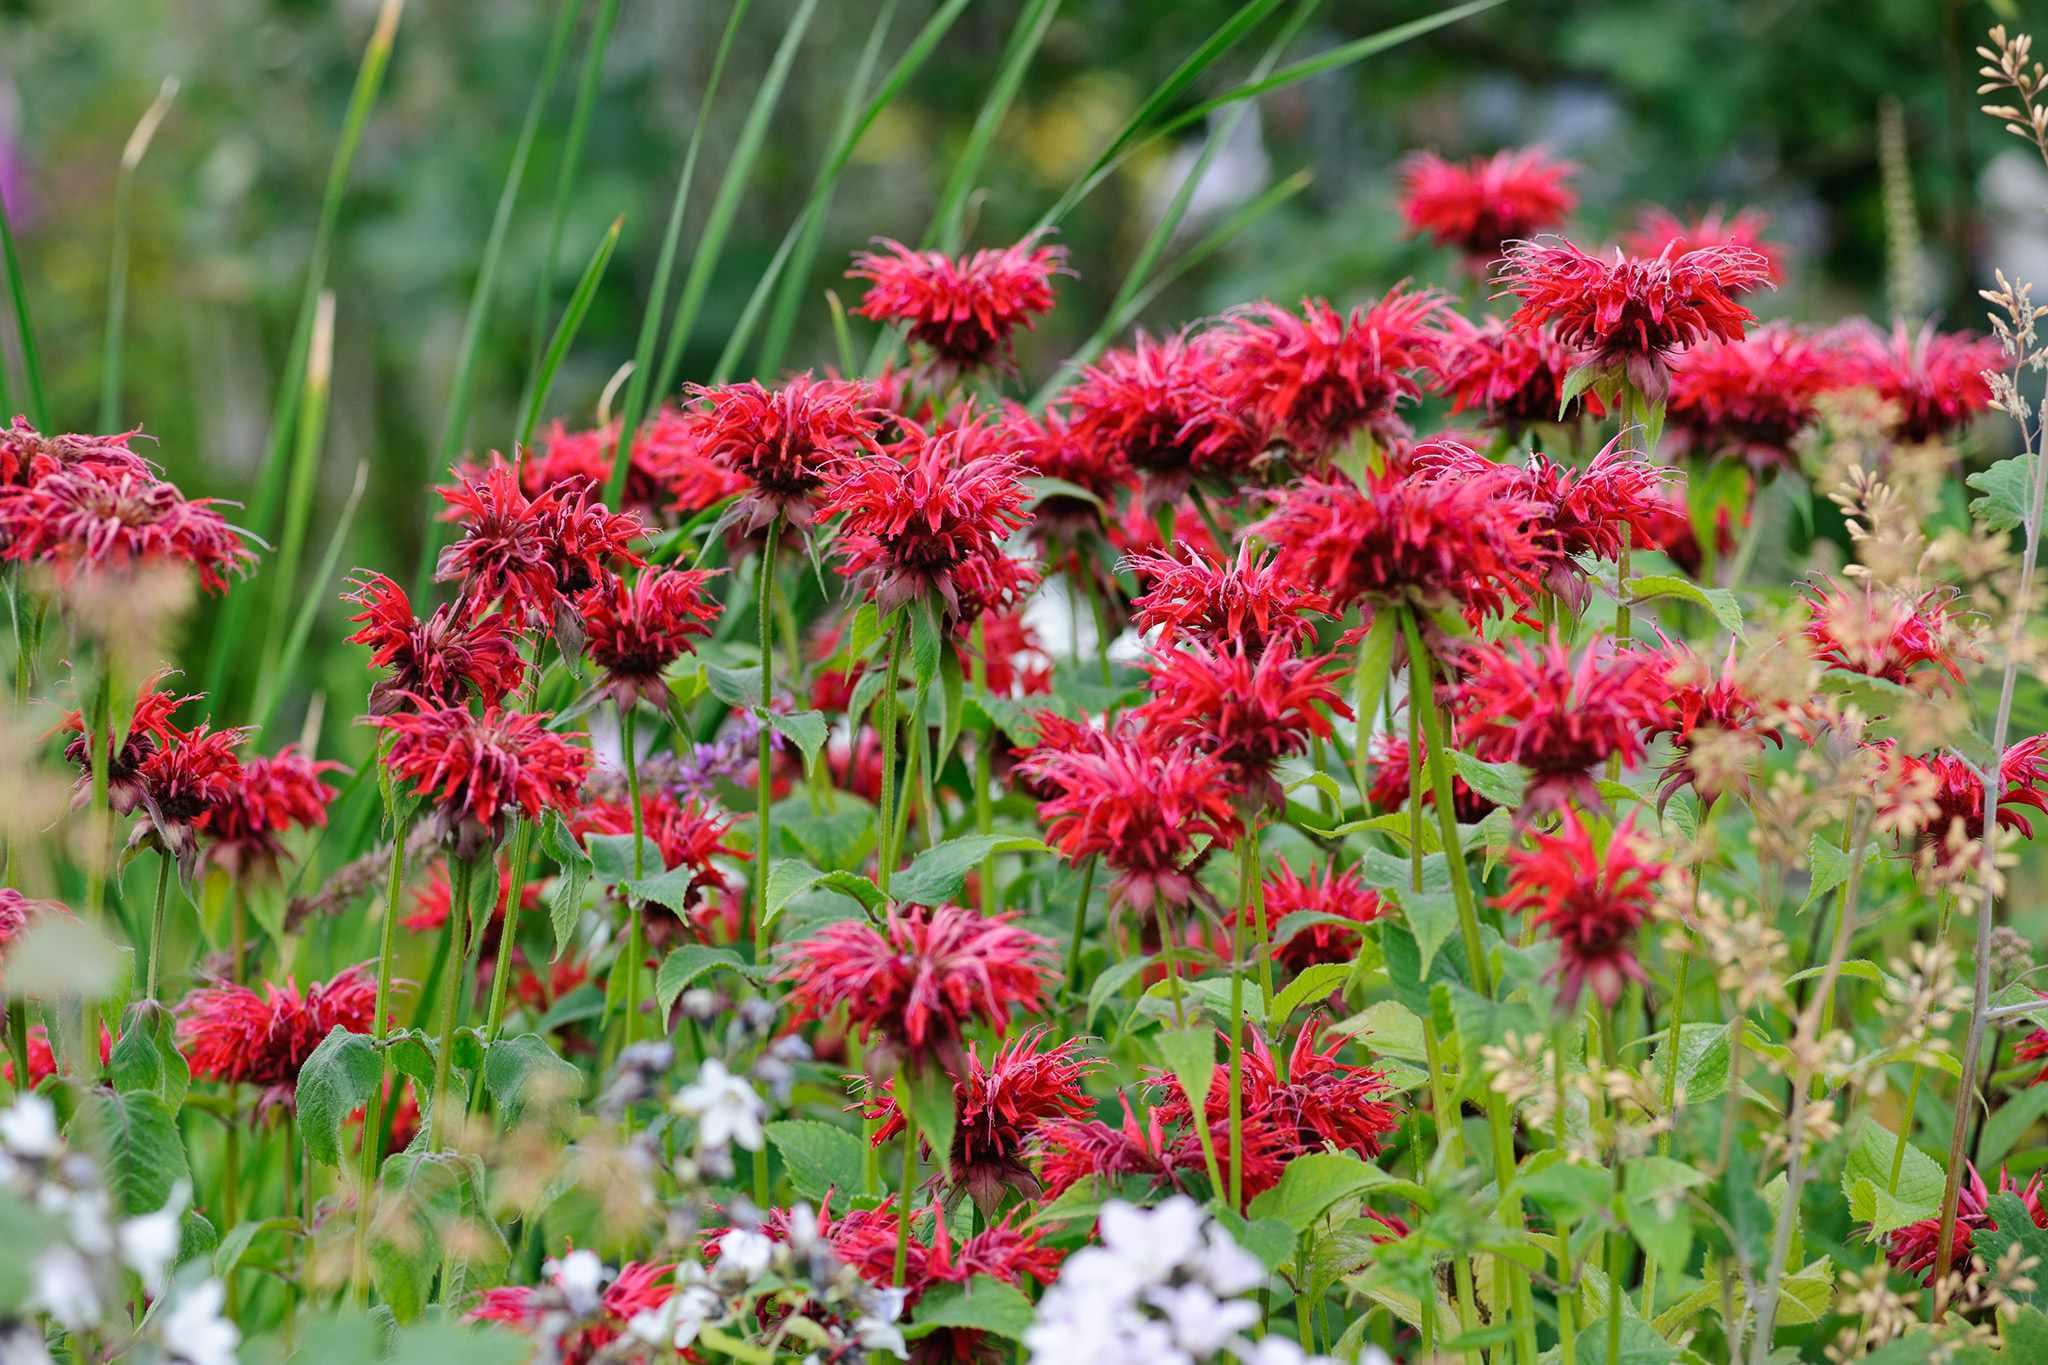 Brilliant red flowers of bergamot 'Cambridge Scarlet'